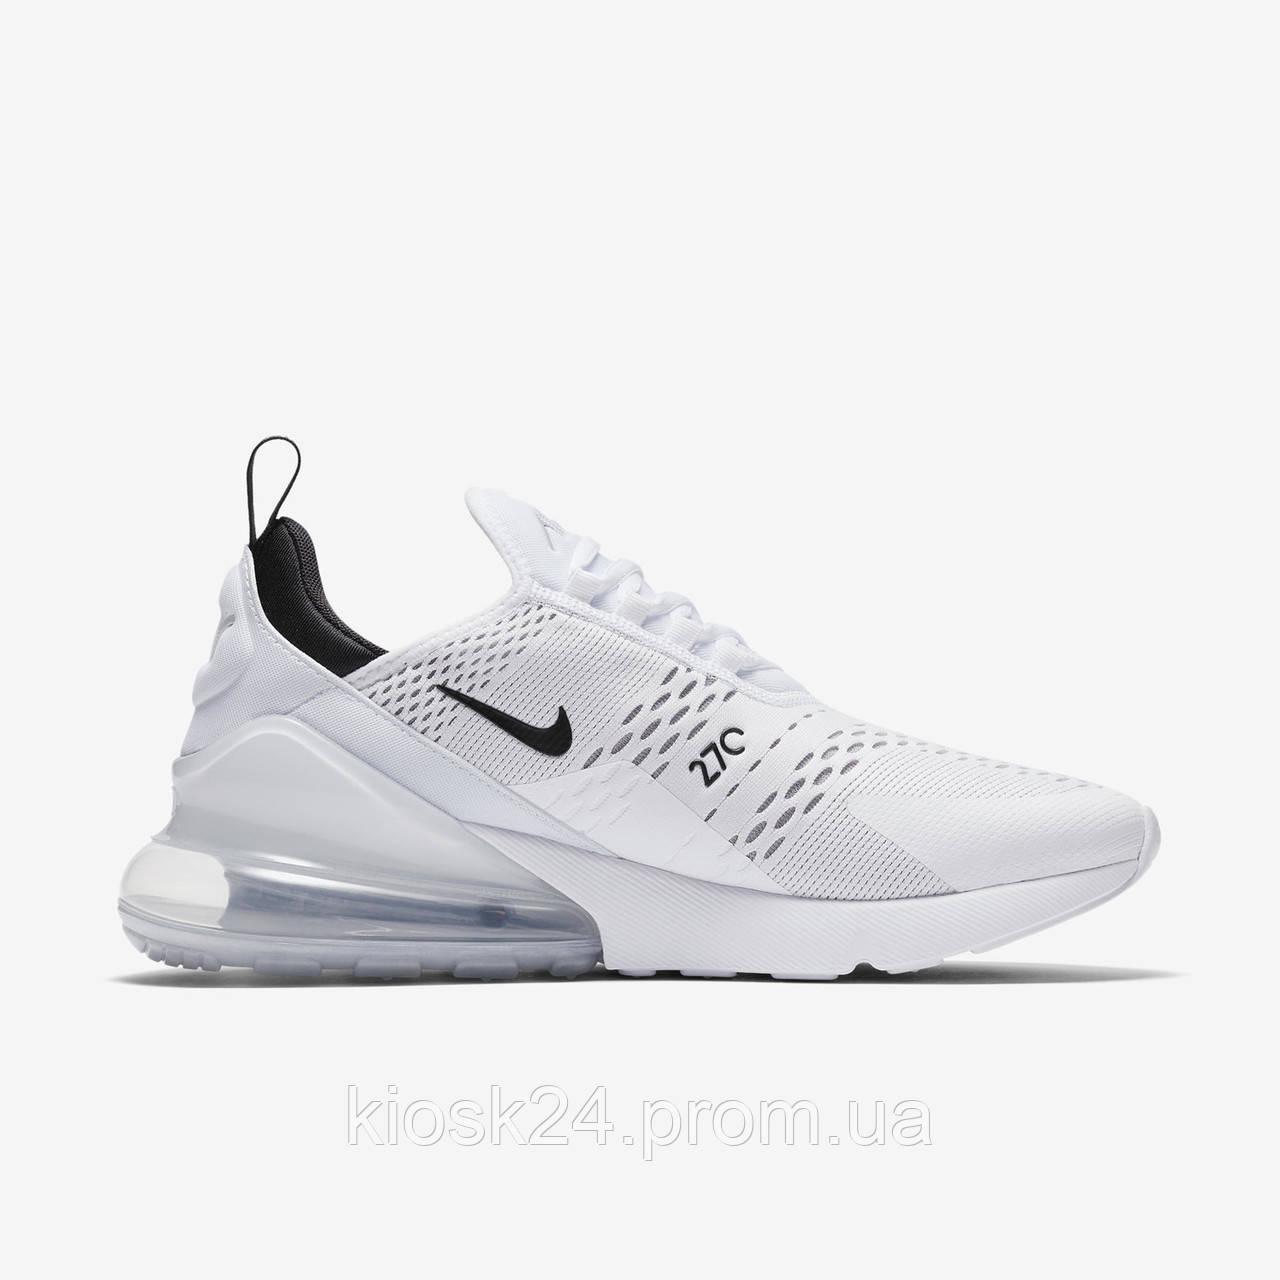 ad855bfc Оригинальные кроссовки Nike Air Max 270 White/Black (AH8050-100) -  Sneakersbox